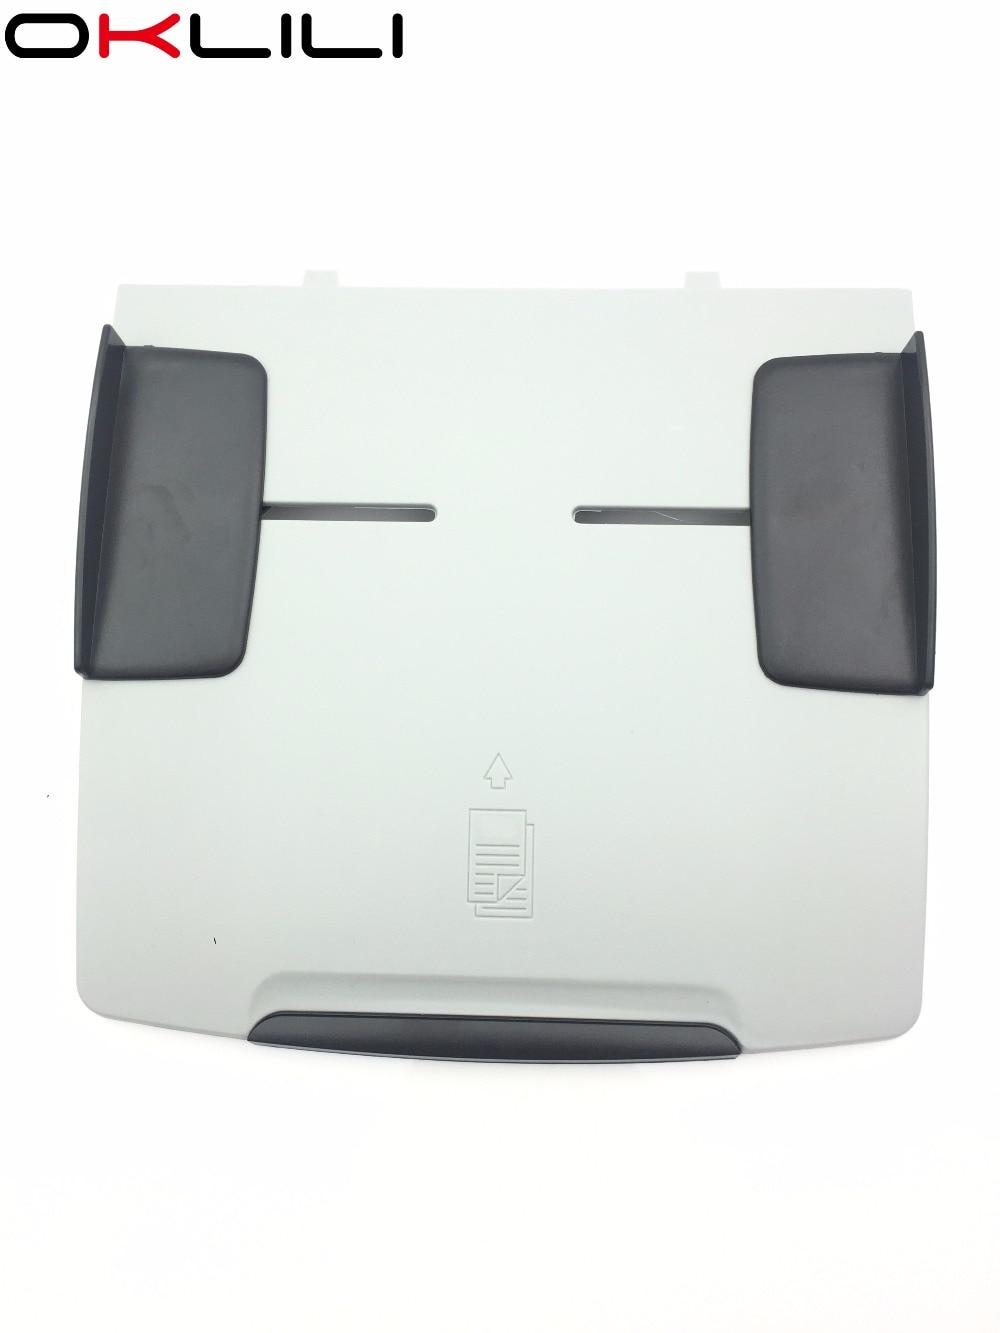 1X Q6500-60119 Q3948-60214 CB534-60112 ADF Paper Input Tray For HP M1522 CM1312 CM2320 3390 3392 M2727 2820 2840 3050 3052 3055